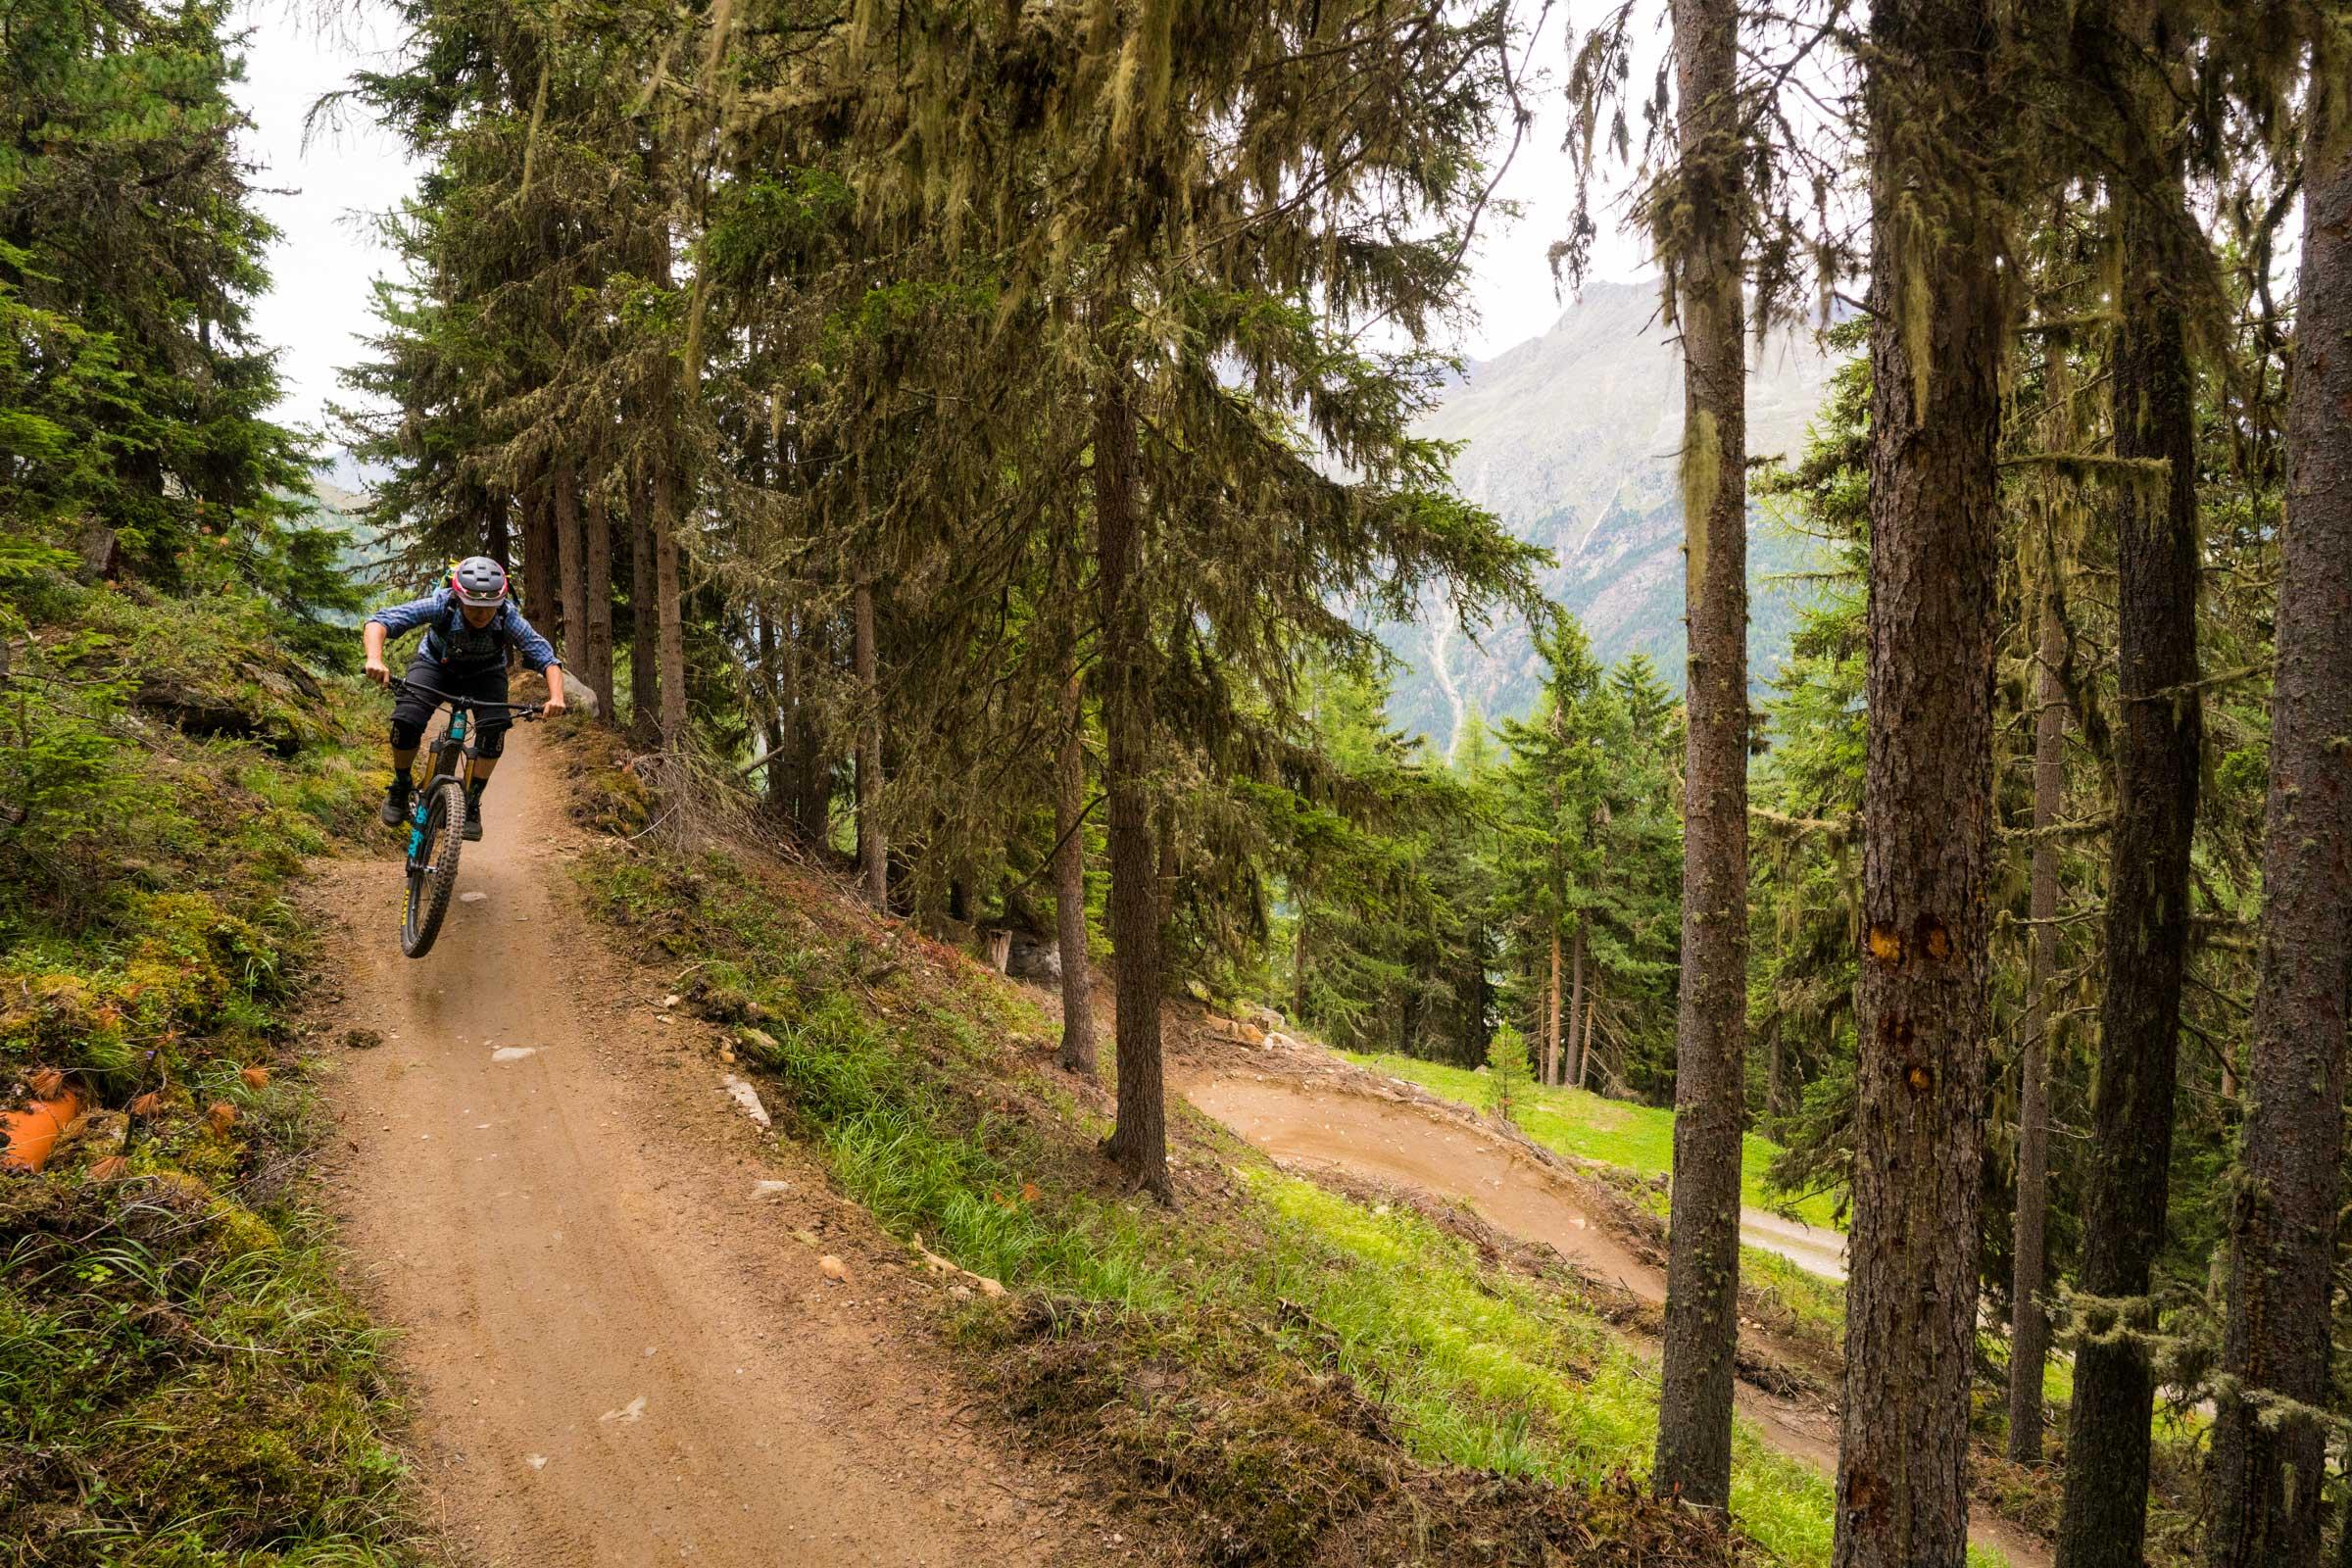 Ohn Line - Flow Trails Bike Republic Sölden